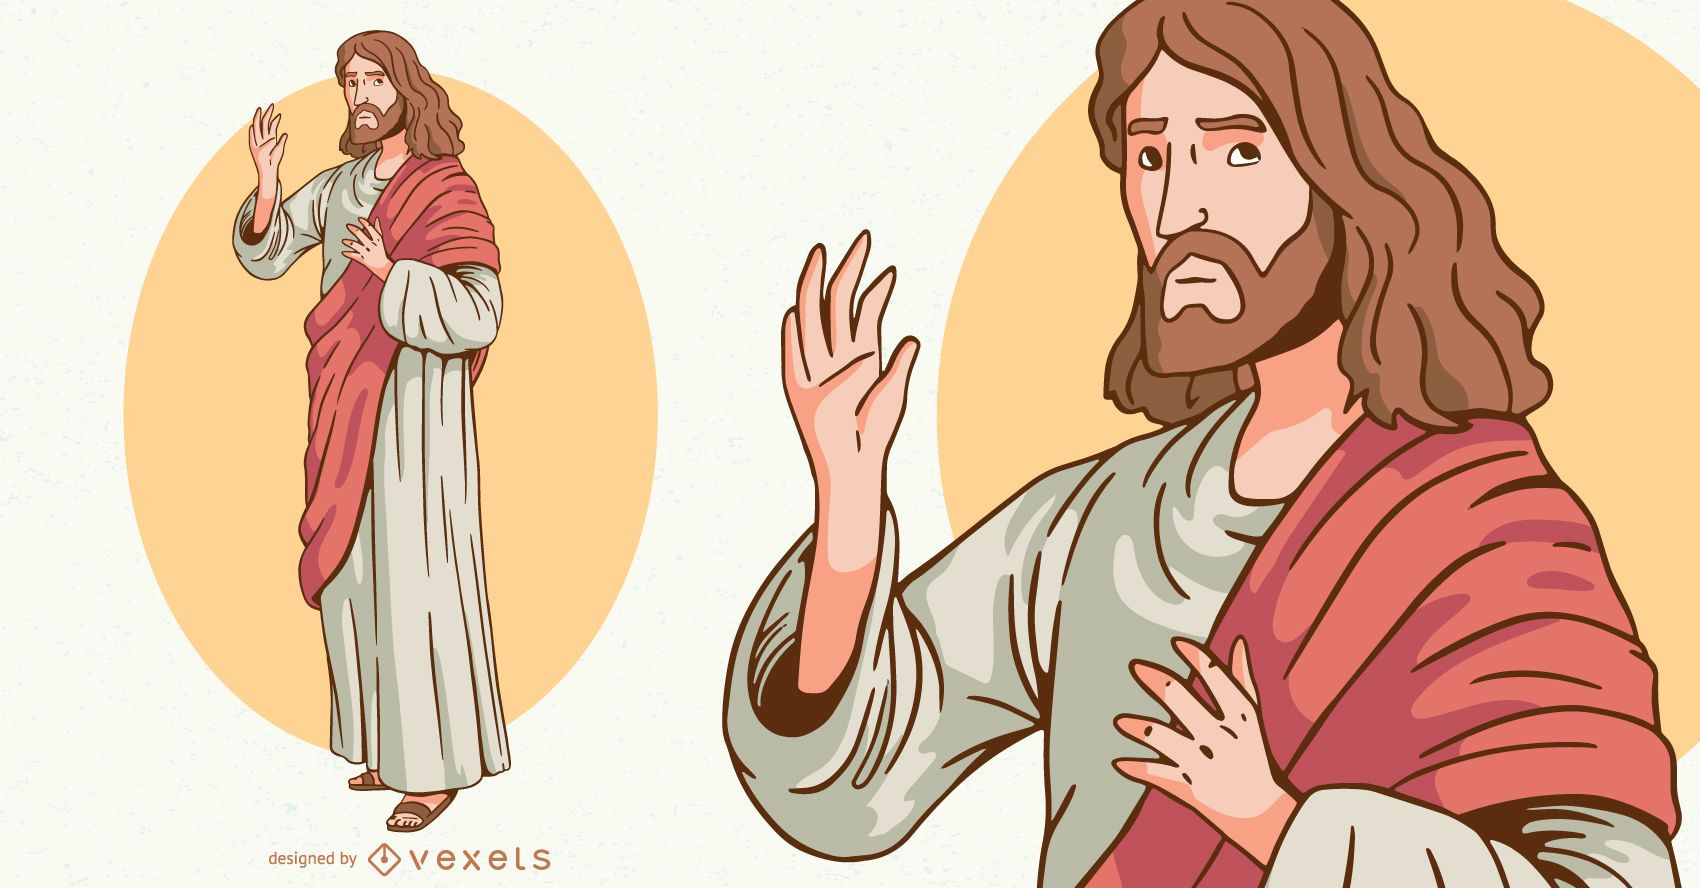 Jesus character illustration design